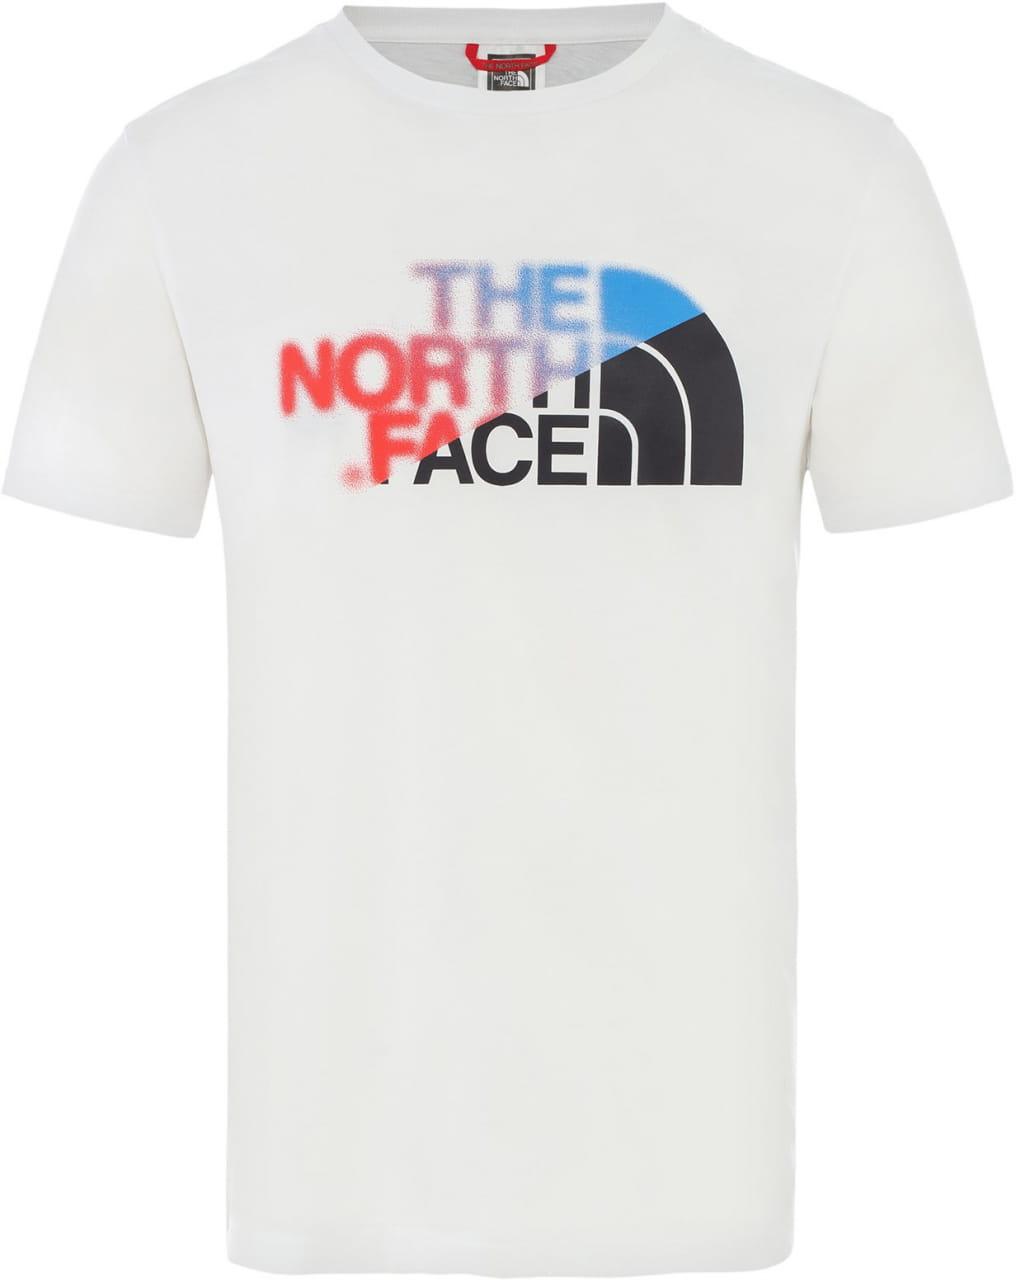 T-Shirts The North Face Men's Bad Glasses T-Shirt